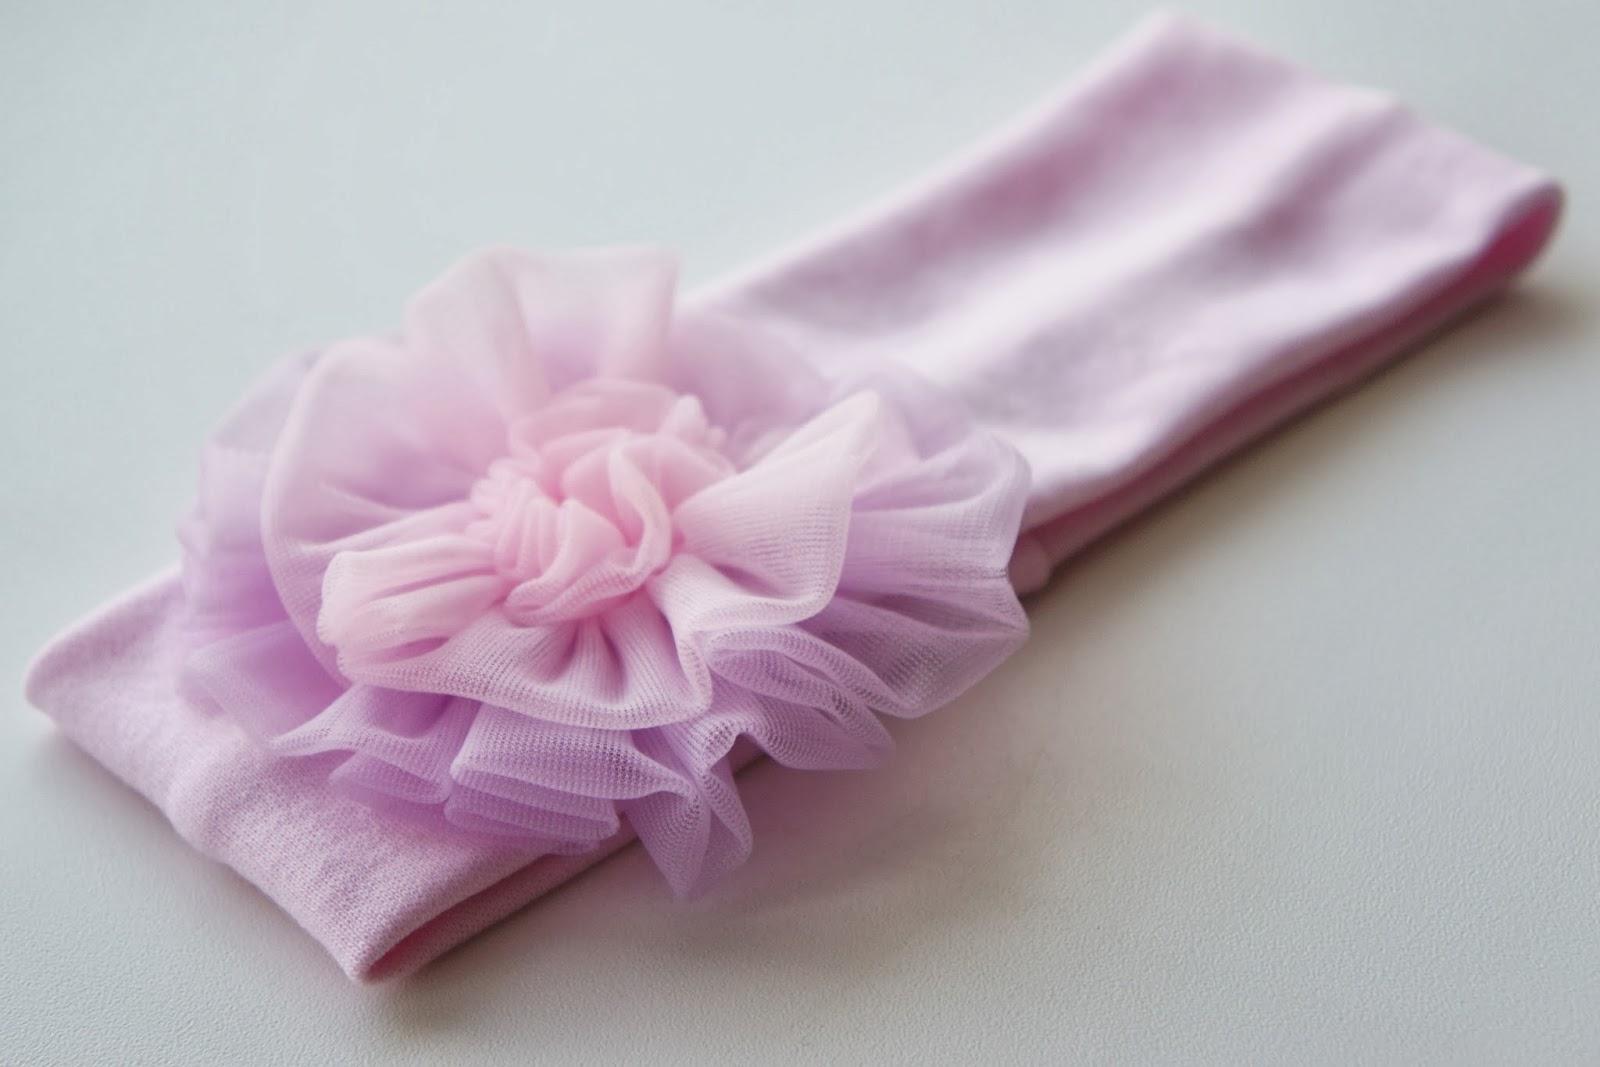 Повязка с цветочком из нейлон-шифона